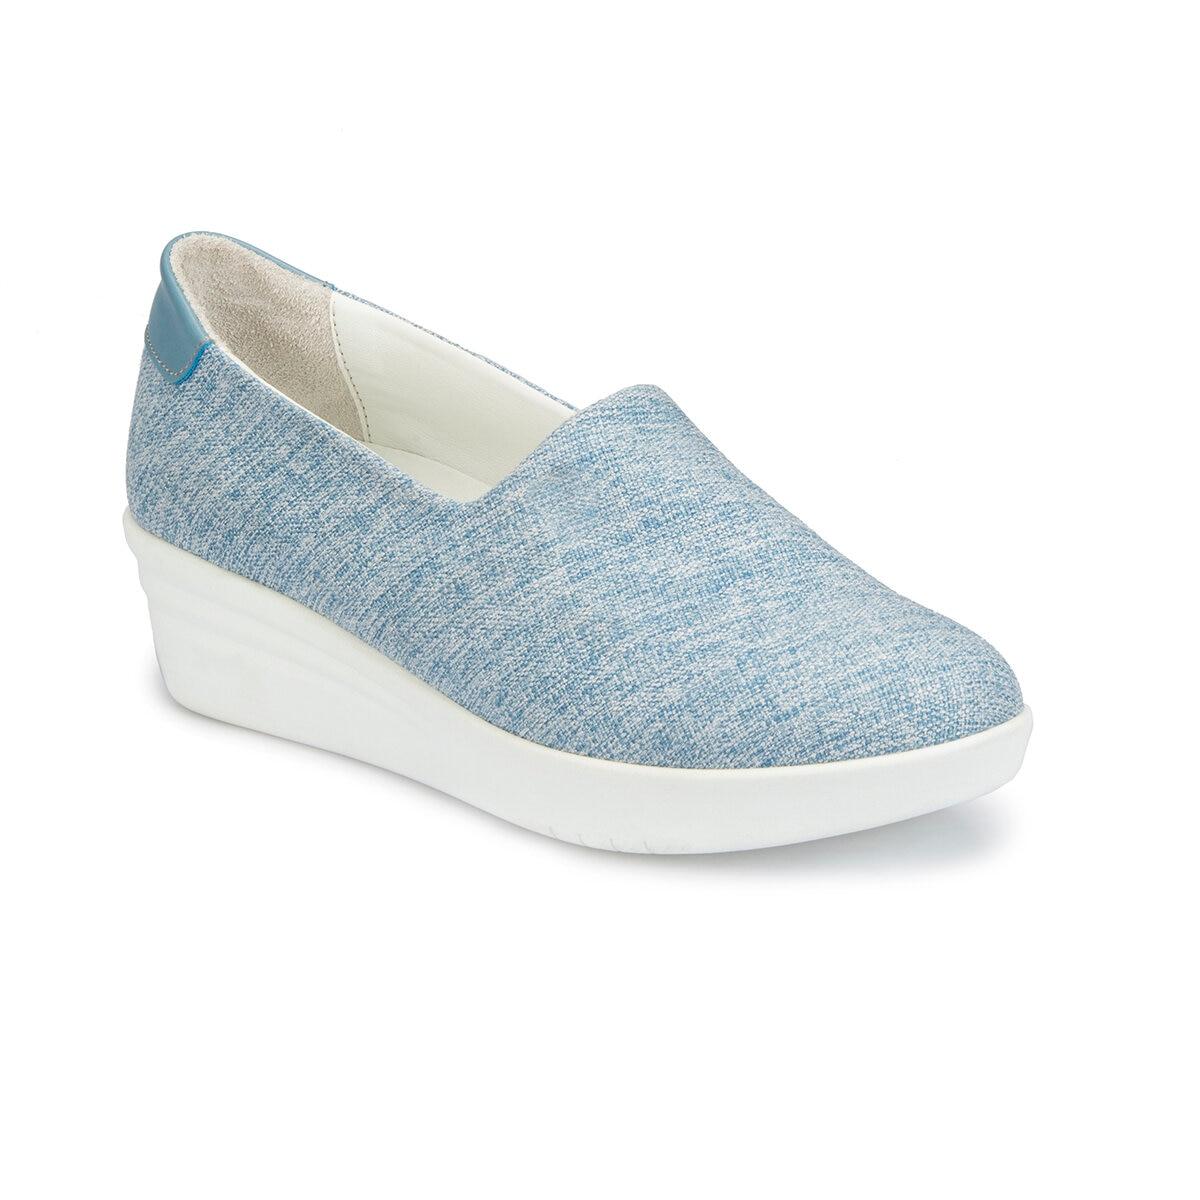 FLO 81. 111305.Z Blue Women Basic Comfort Polaris